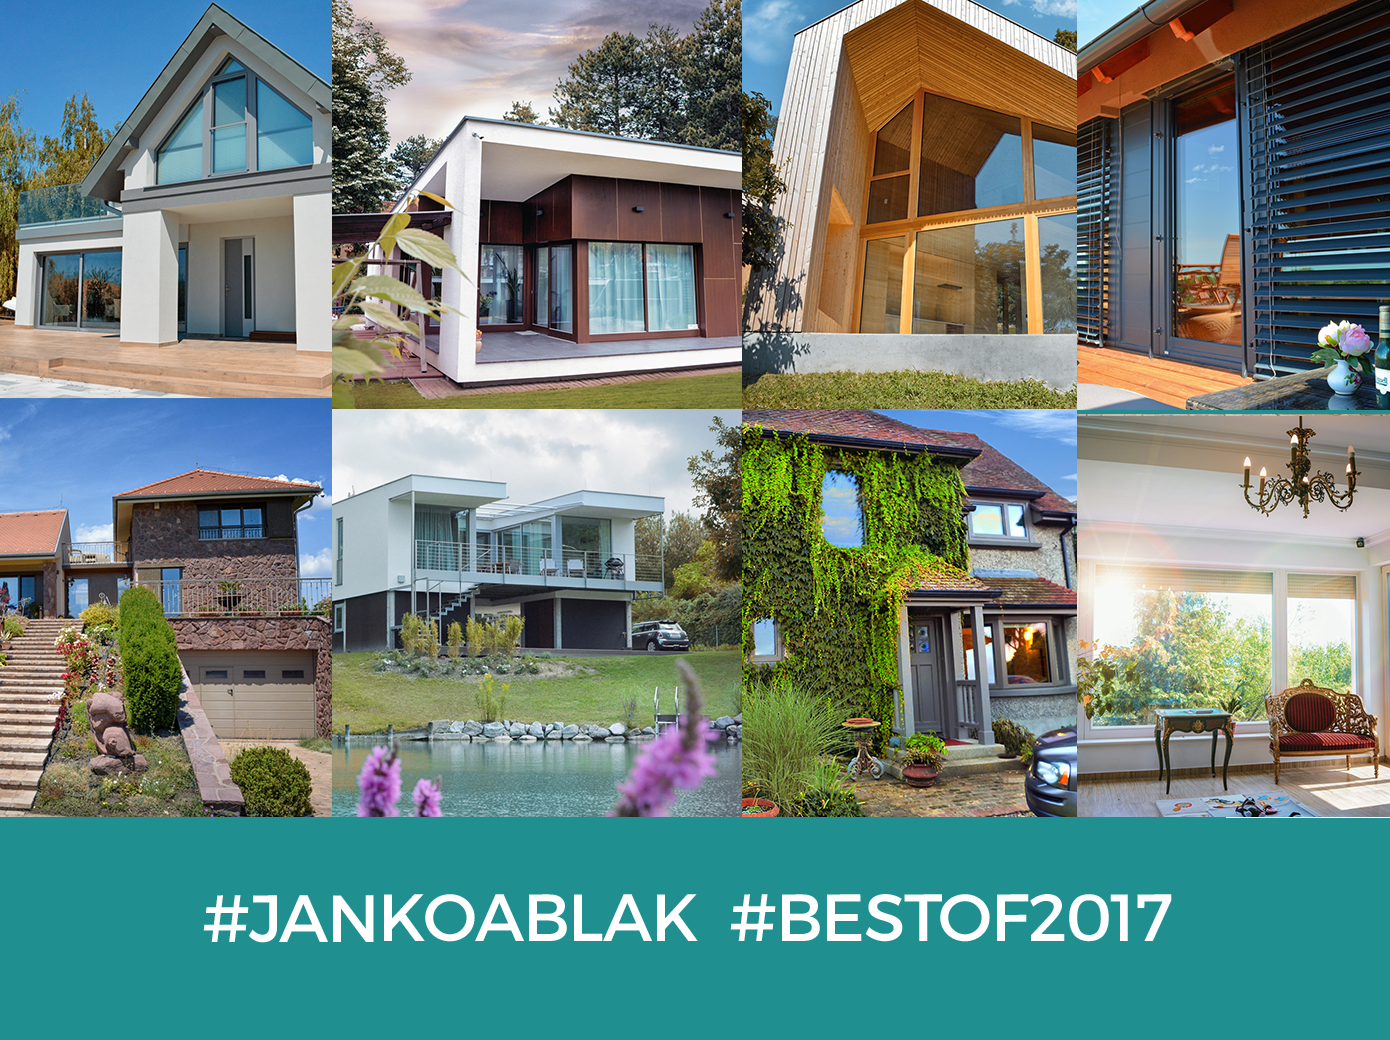 Jankó_ablak_best_of_2017_1080x1920pxweboldal.png